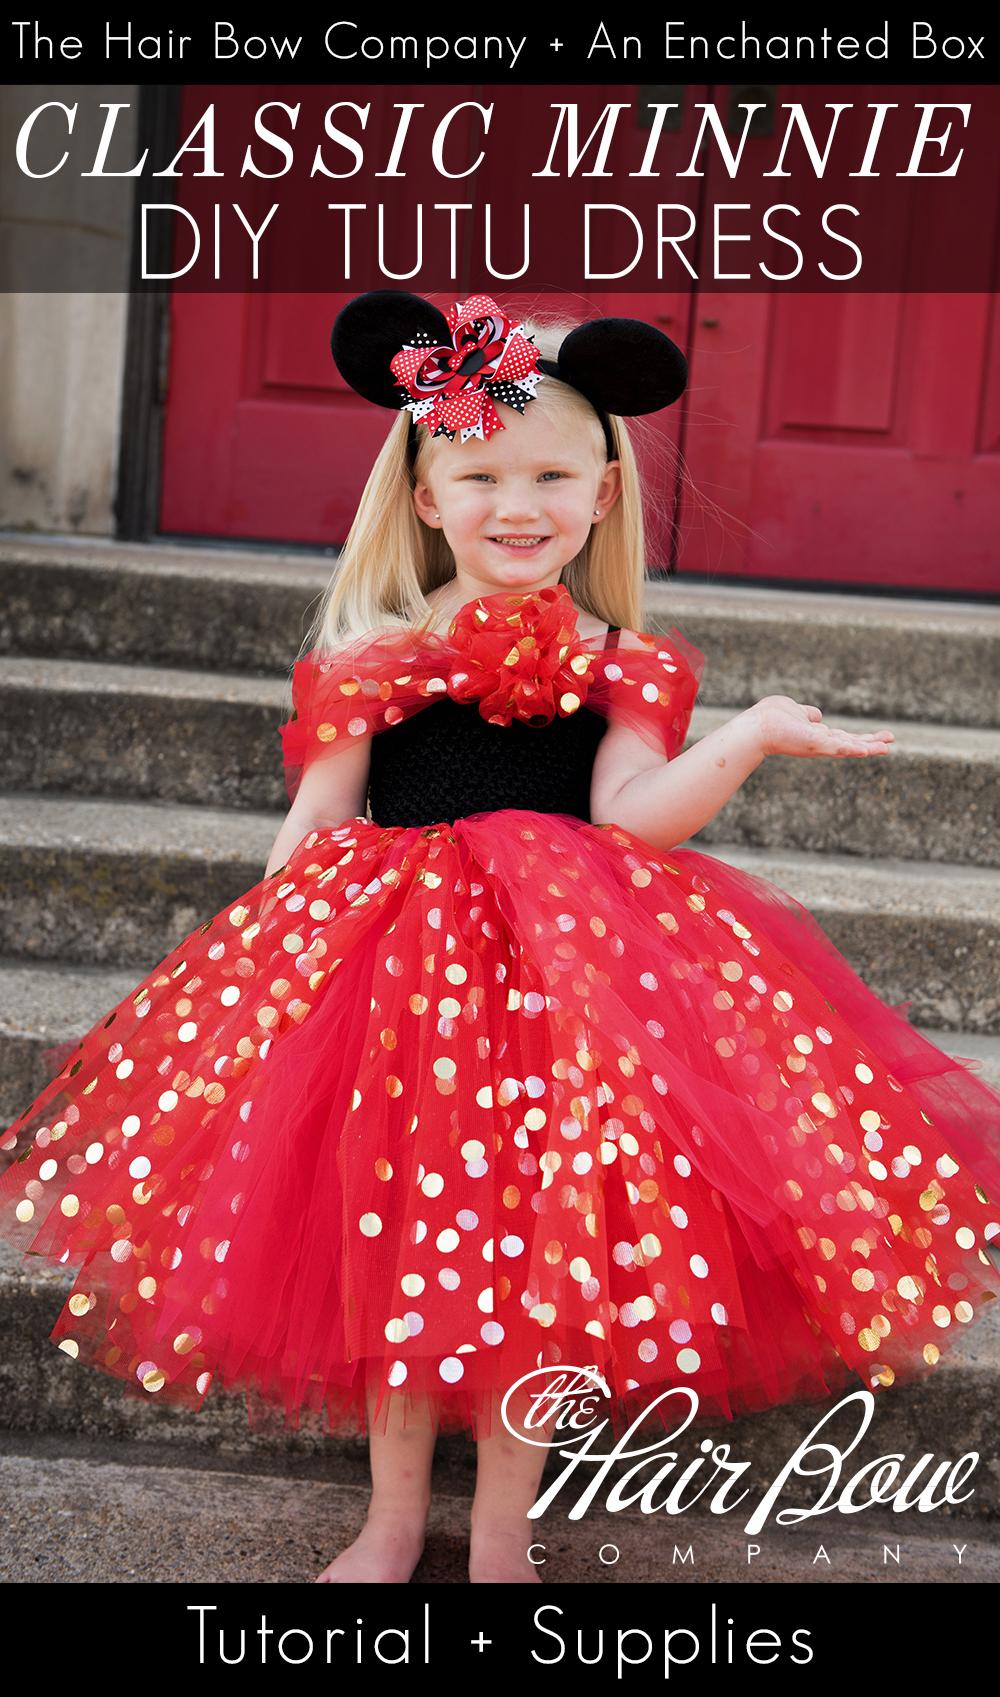 Classic Minnie Mouse Tutu Dress Tutorial